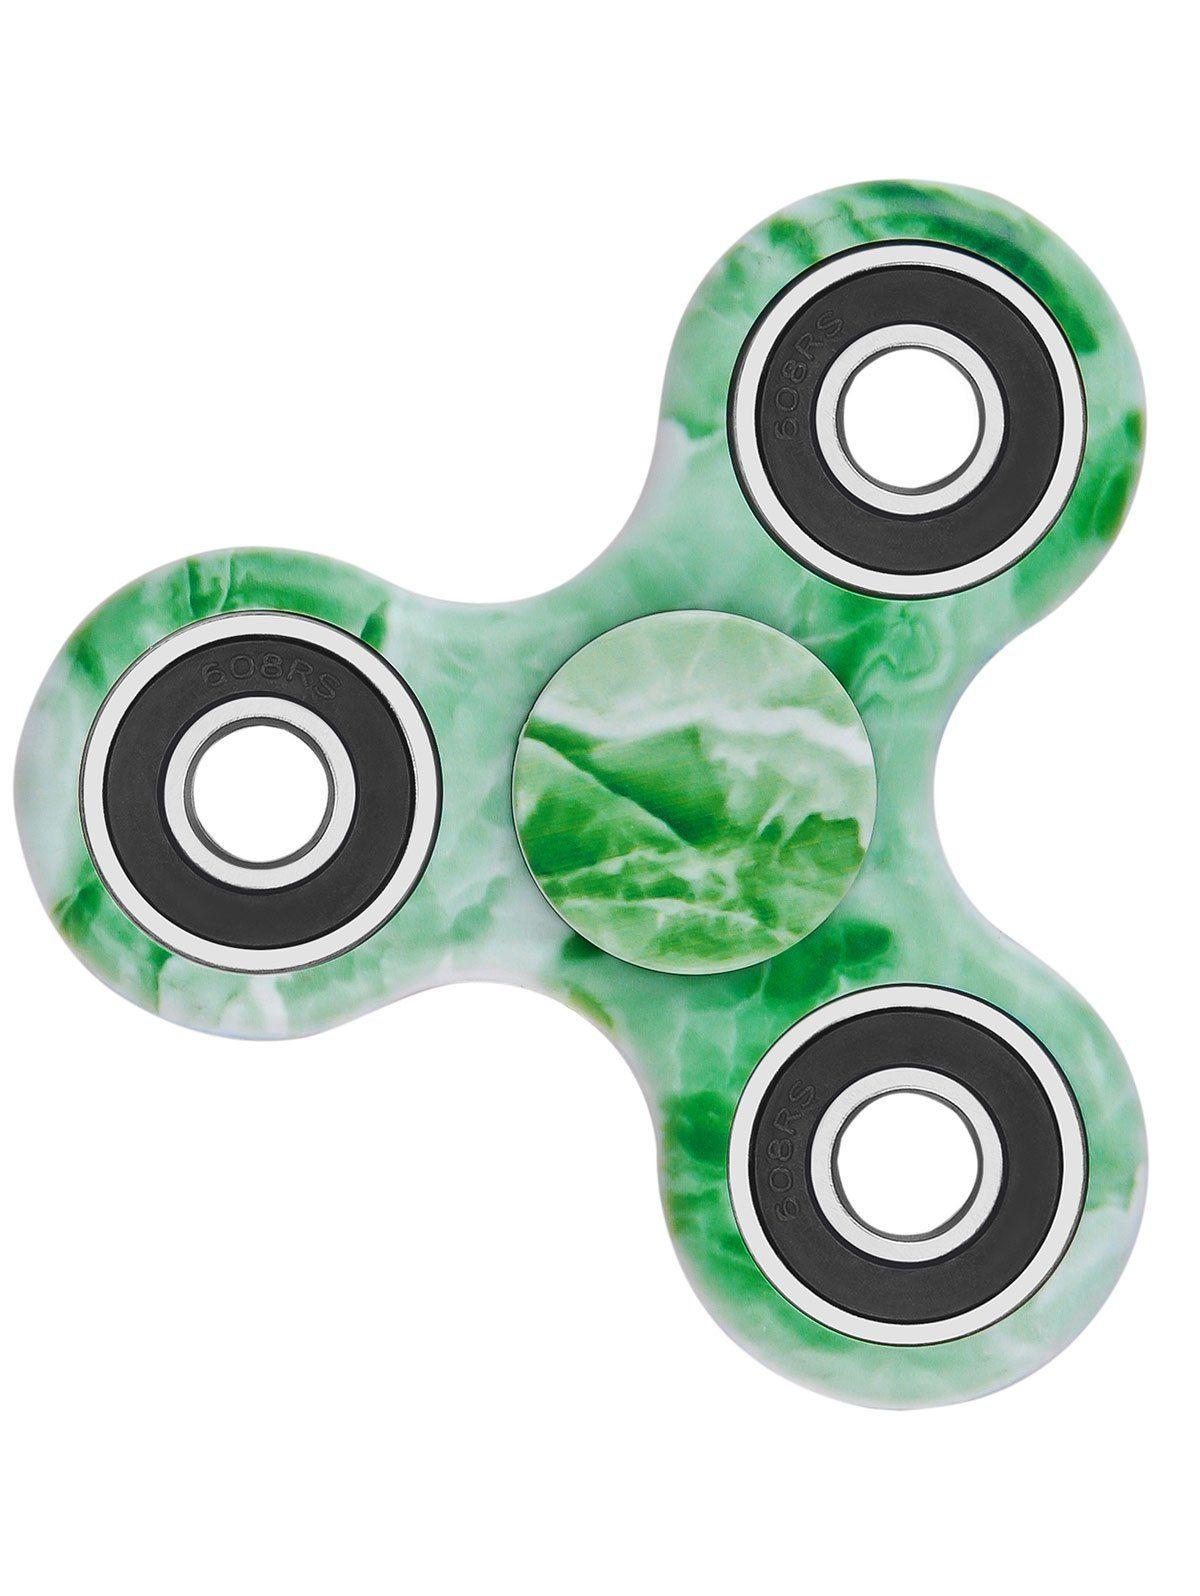 Star Sky Print Stress Relief Focus Toy Fidget Spinner - GREEN